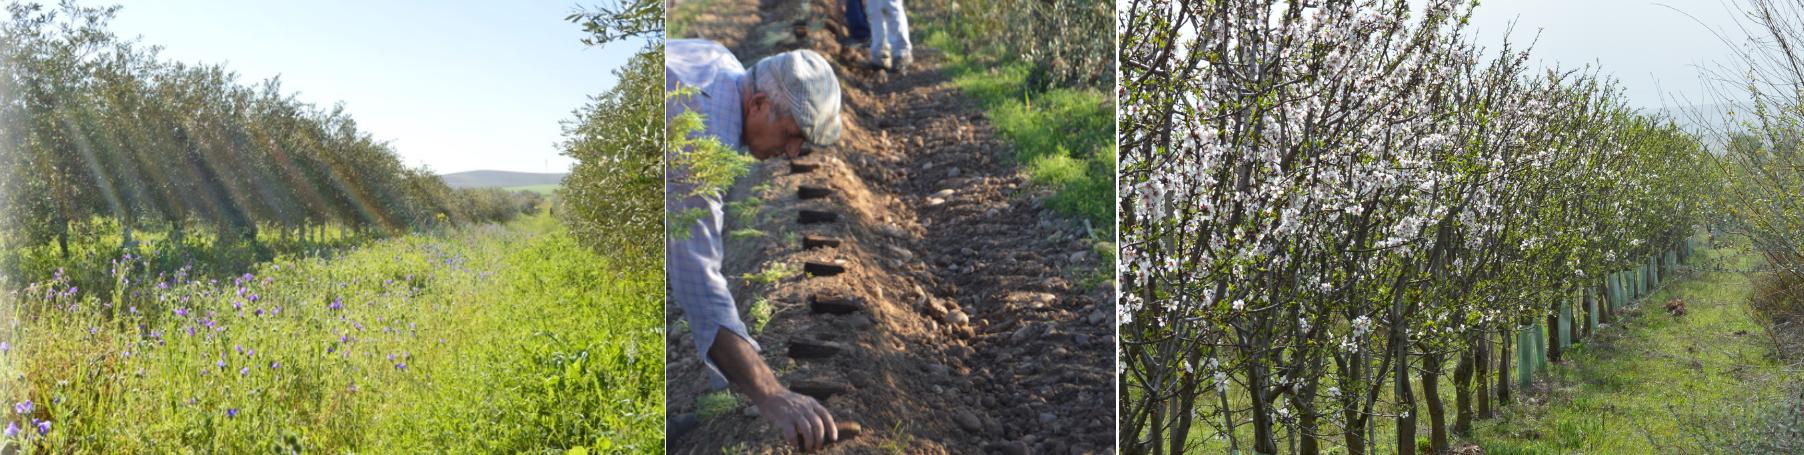 Biodynamic-organic-farm-cortijo-el-puerto-spain-healing-supporting-biodiversity-environmental-awareness